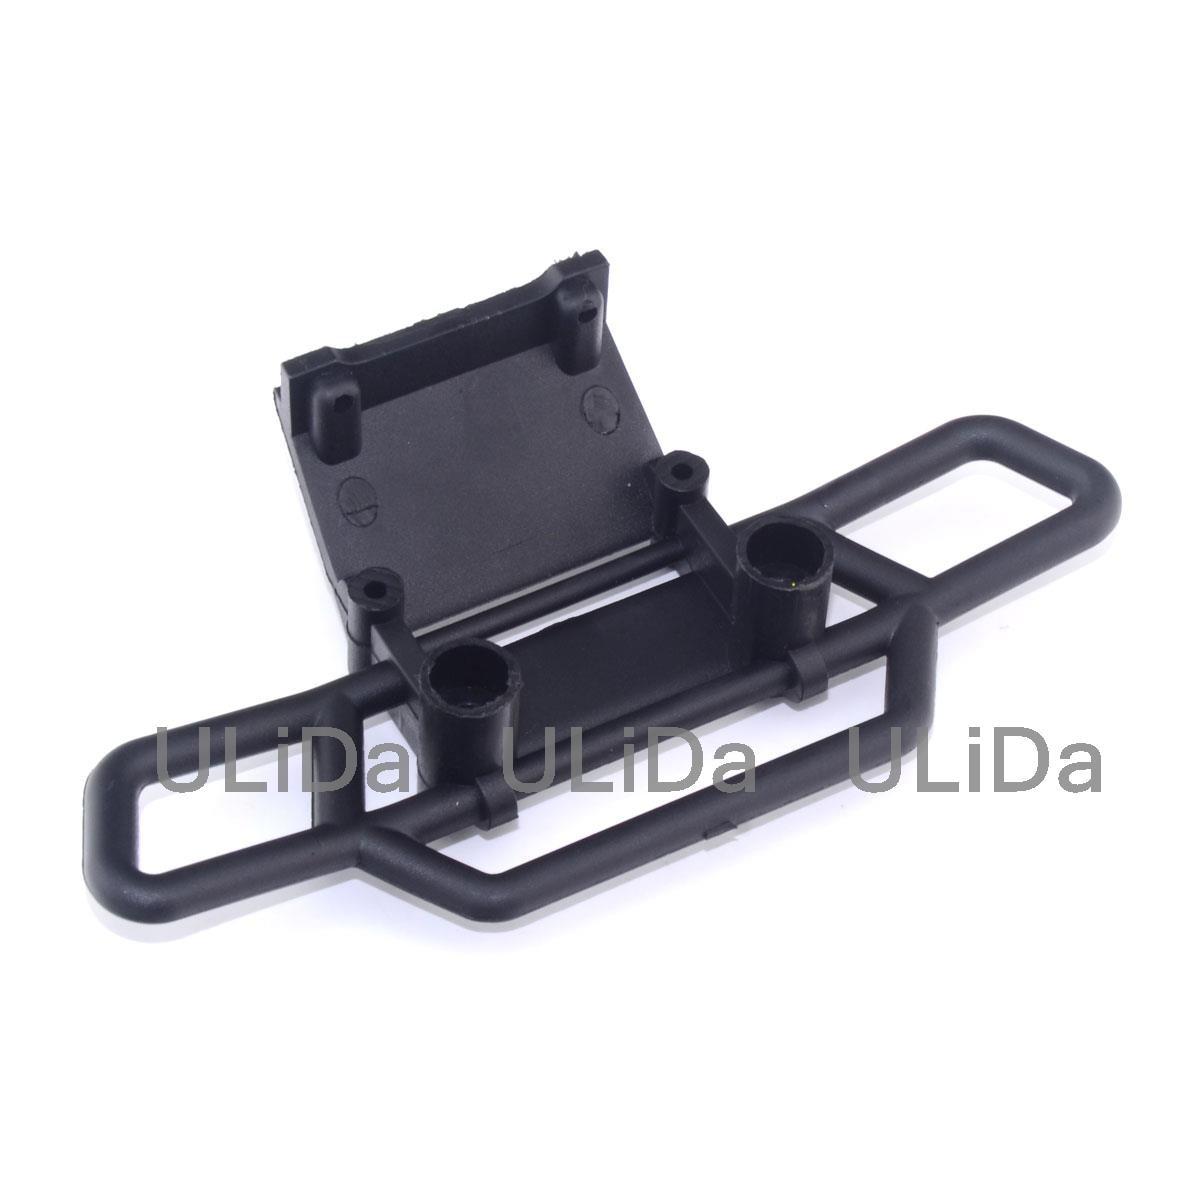 Perfeclan 1//10 RC Nitrol Car 08002 Front Bumper Beam Black for HSP 94111 Accessories